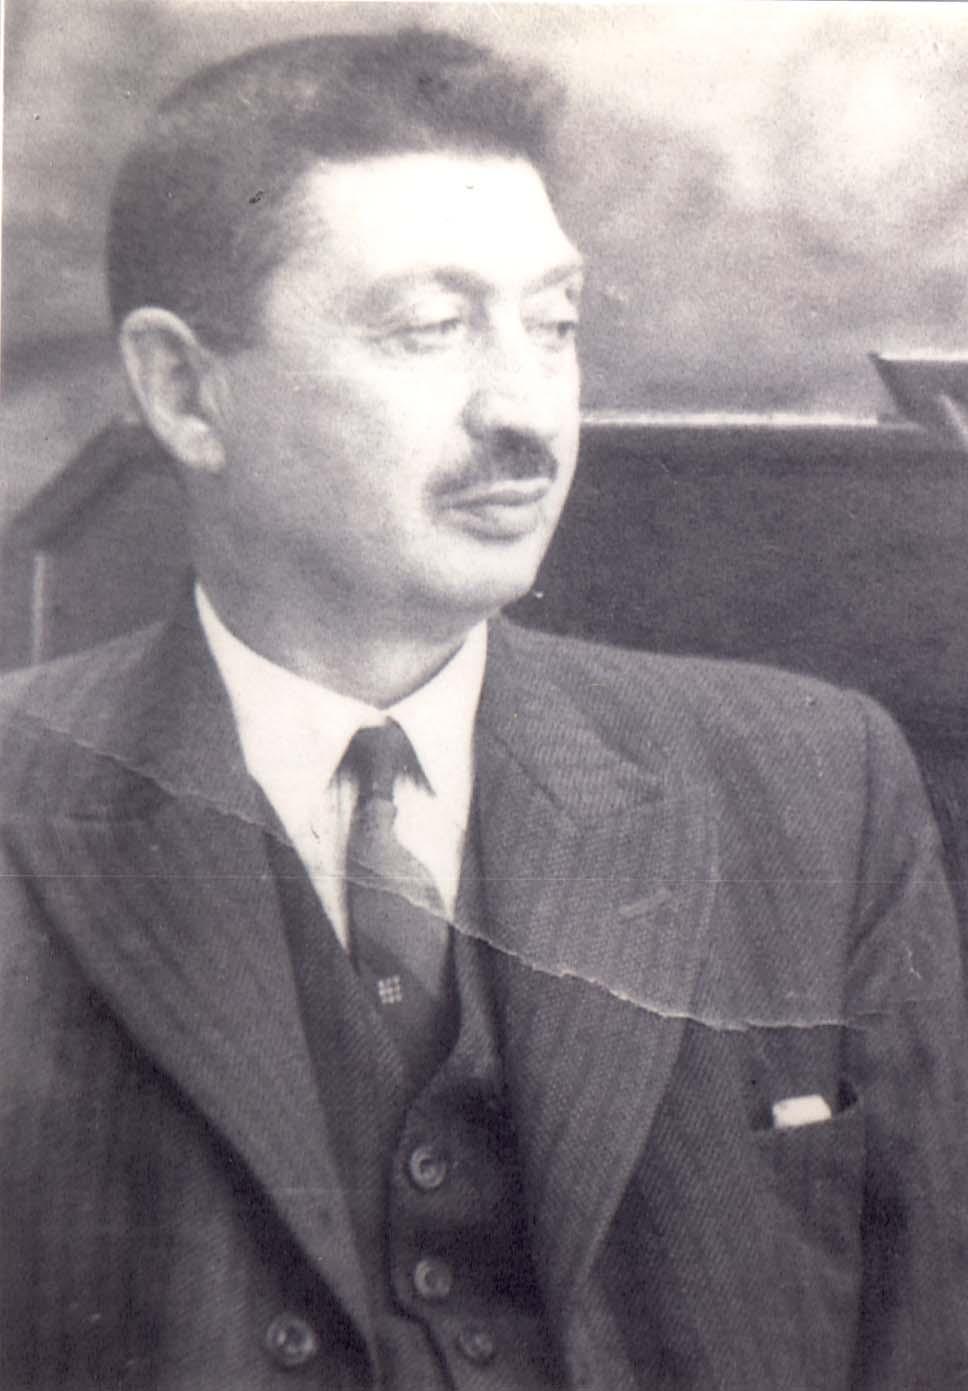 Abraham Goldschmidt, Quelle yvphotocollection